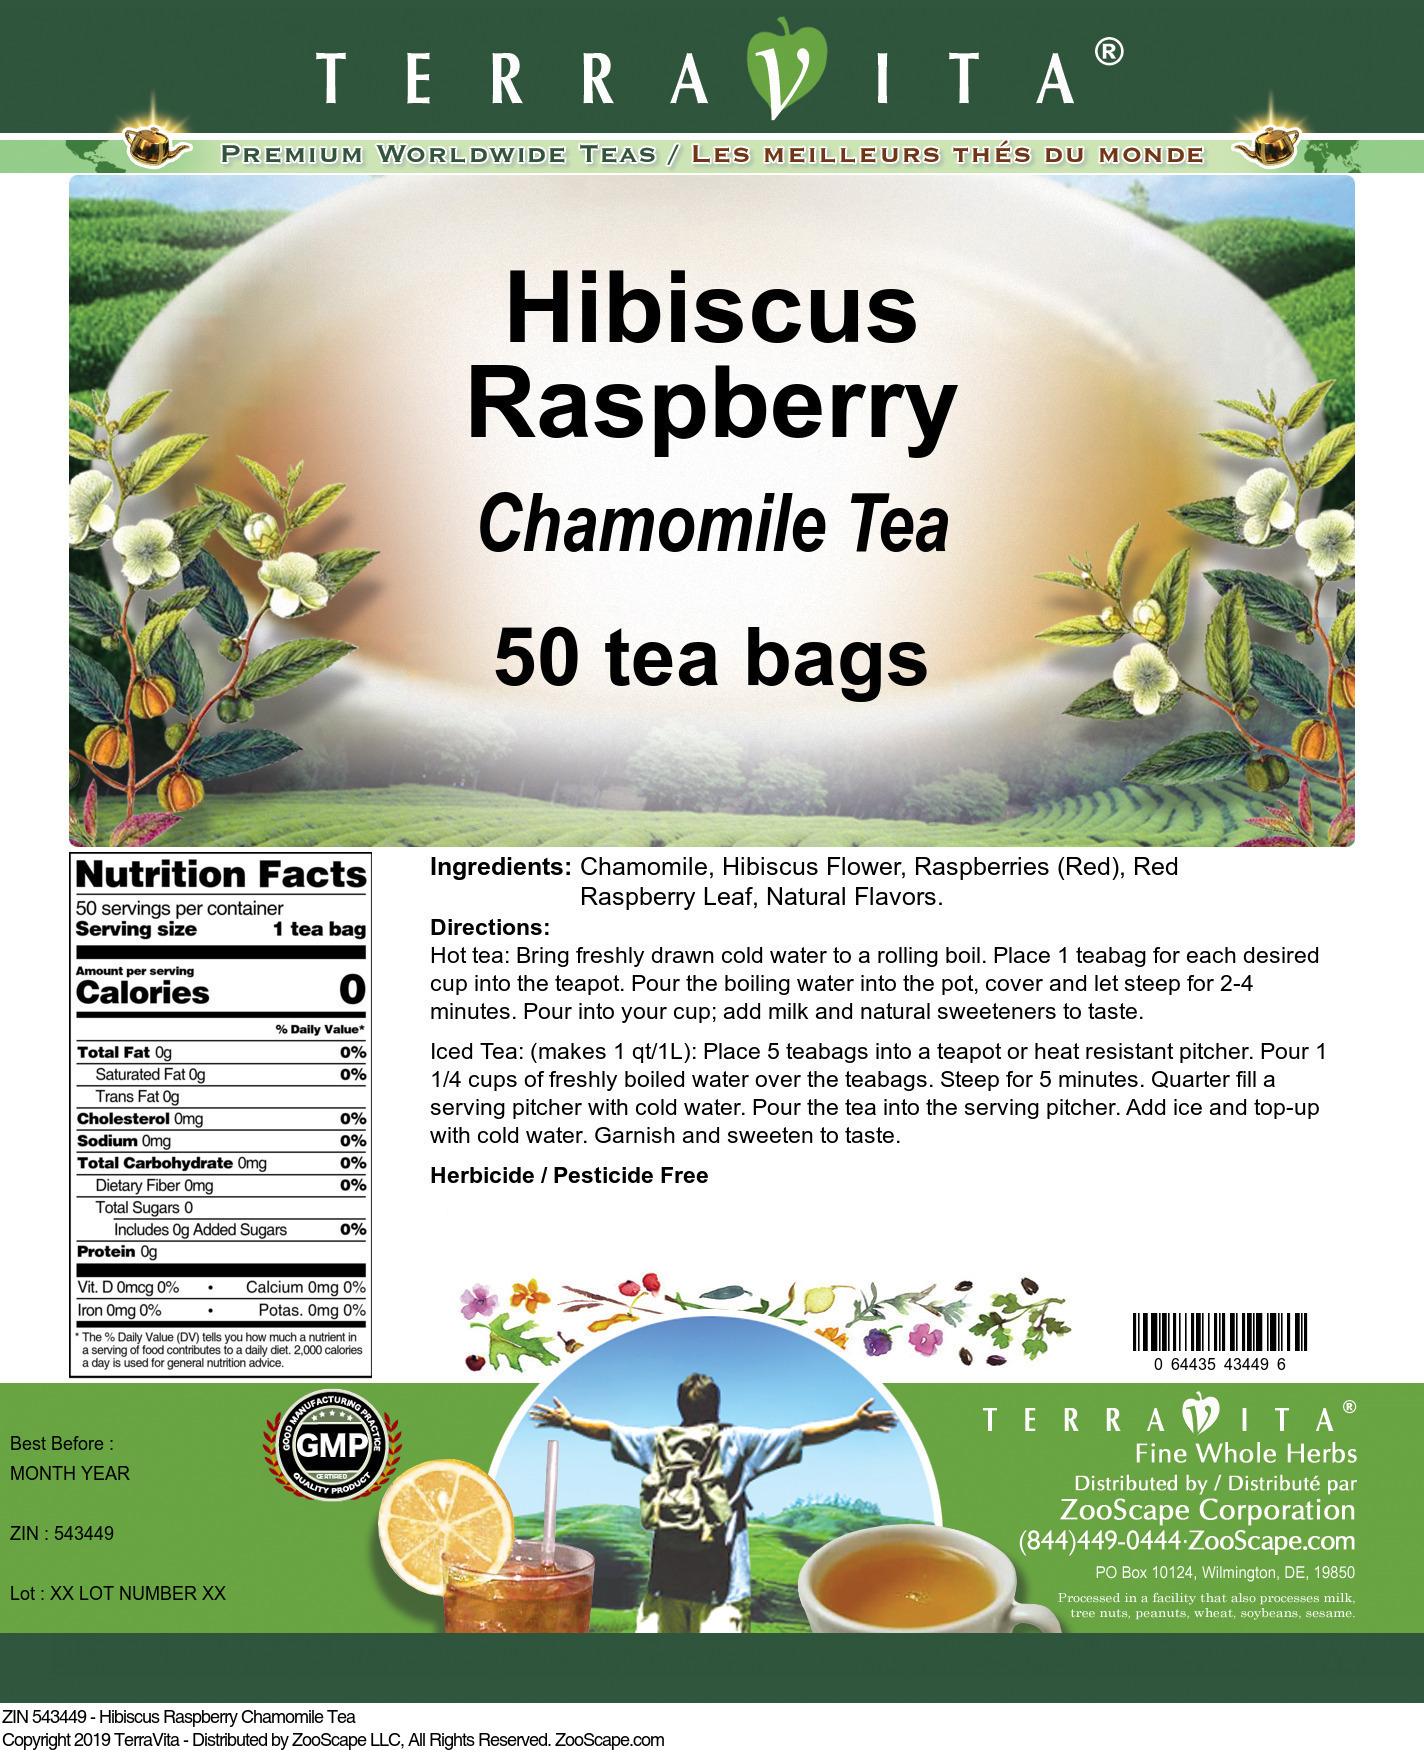 Hibiscus Raspberry Chamomile Tea